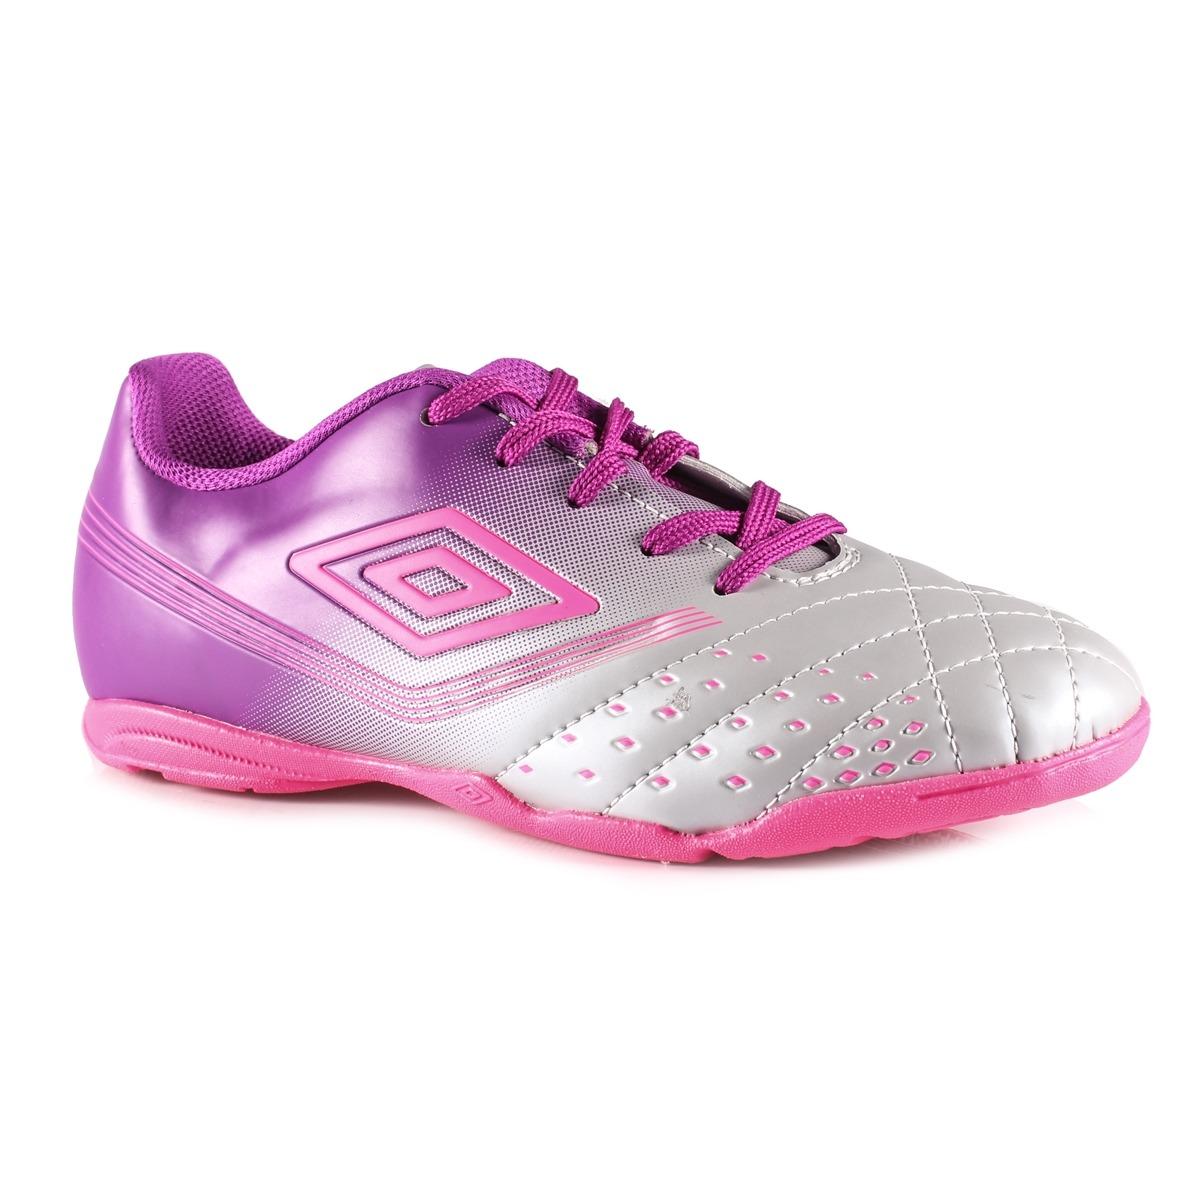 328739bfa6 chuteira futsal feminina umbro indoor fifty cinza roxo rosa. Carregando  zoom.